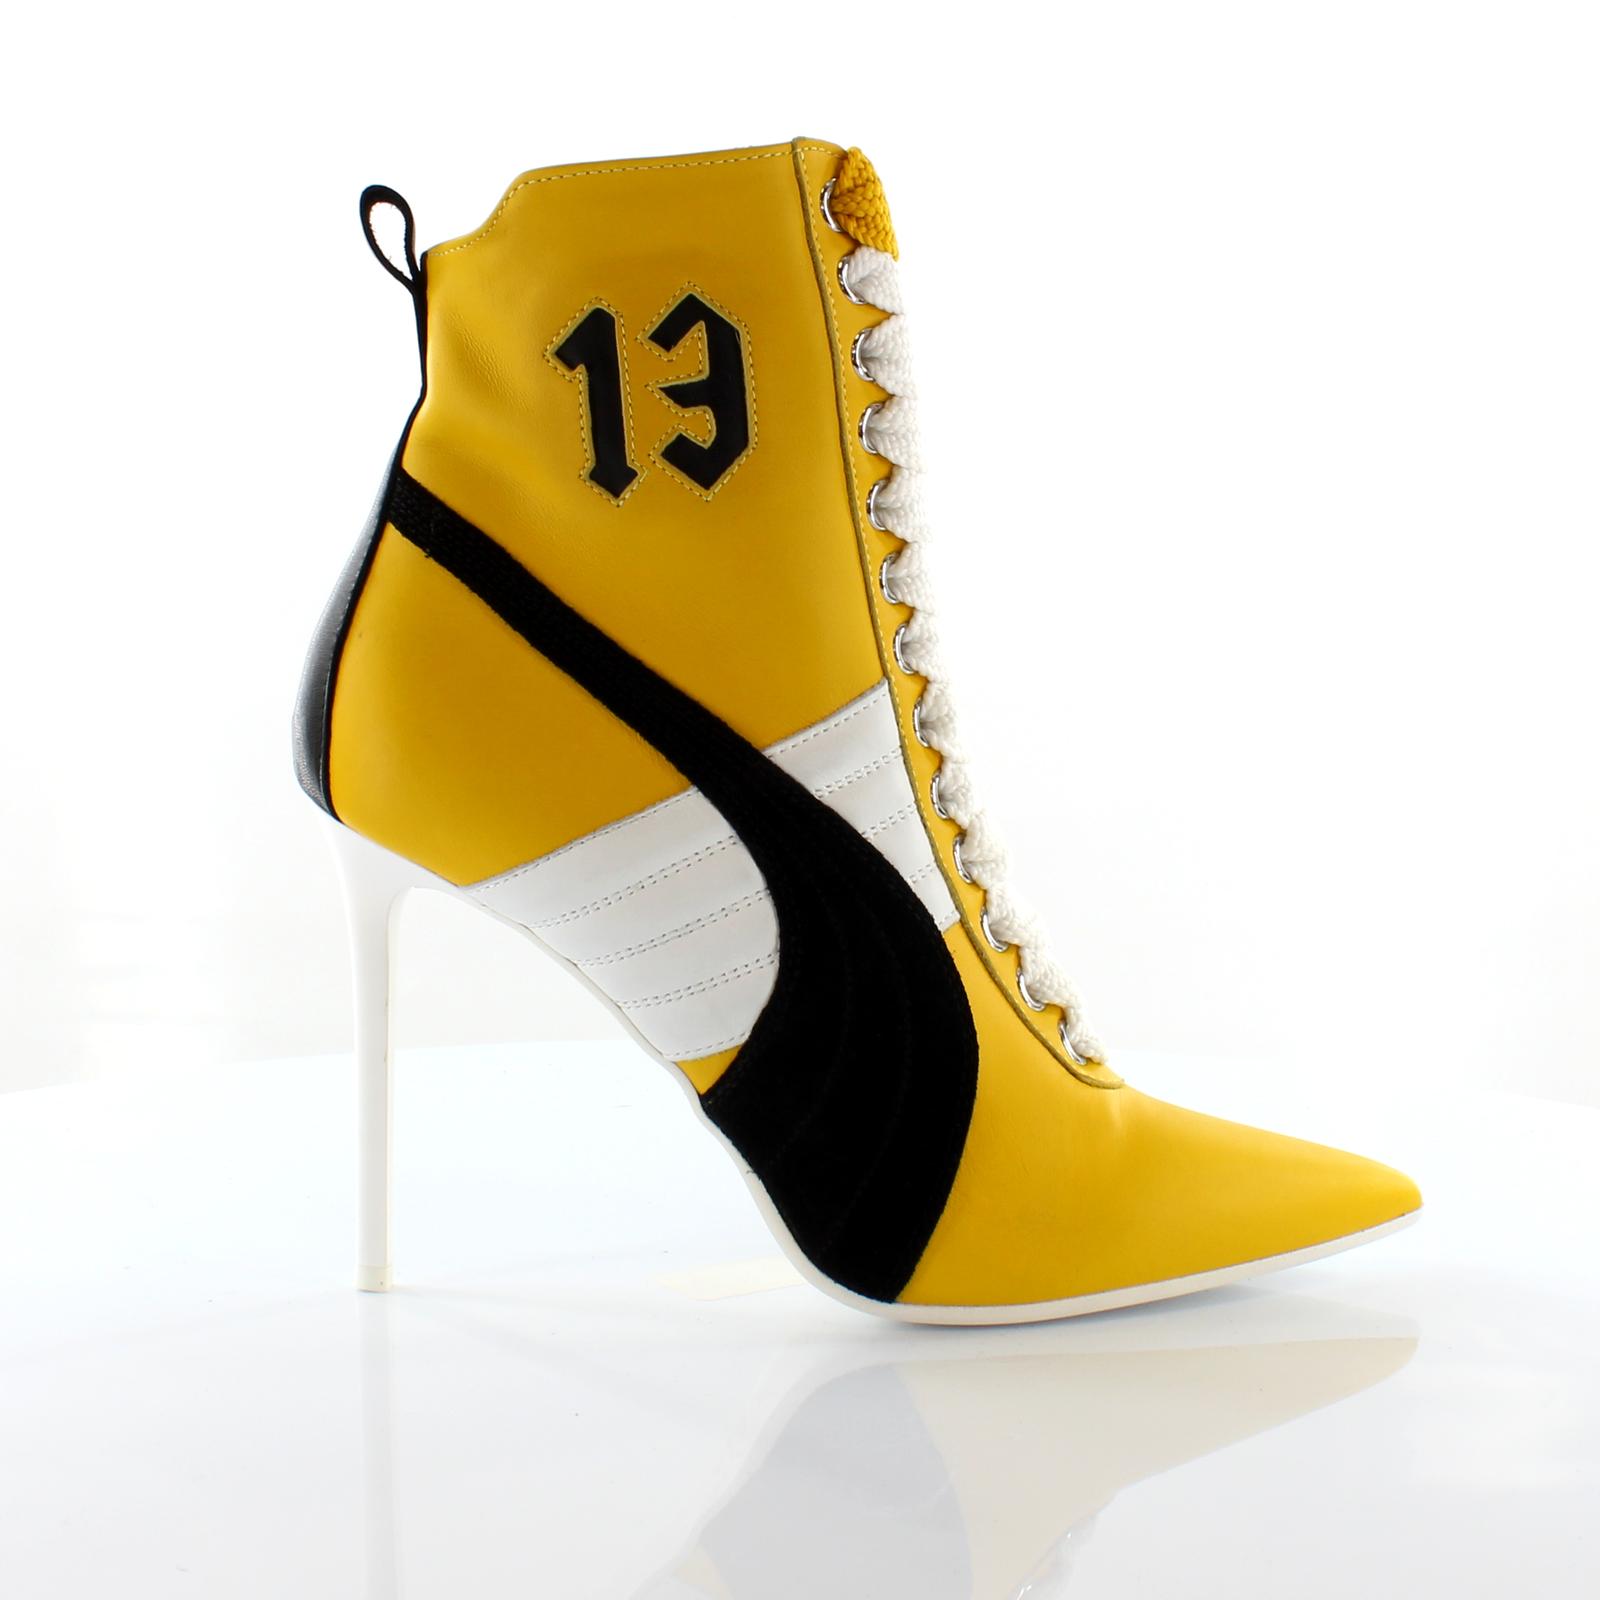 Puma Fenty by Rihanna 13 Yellow Black Leather Womens High Heel Shoes 363038 01